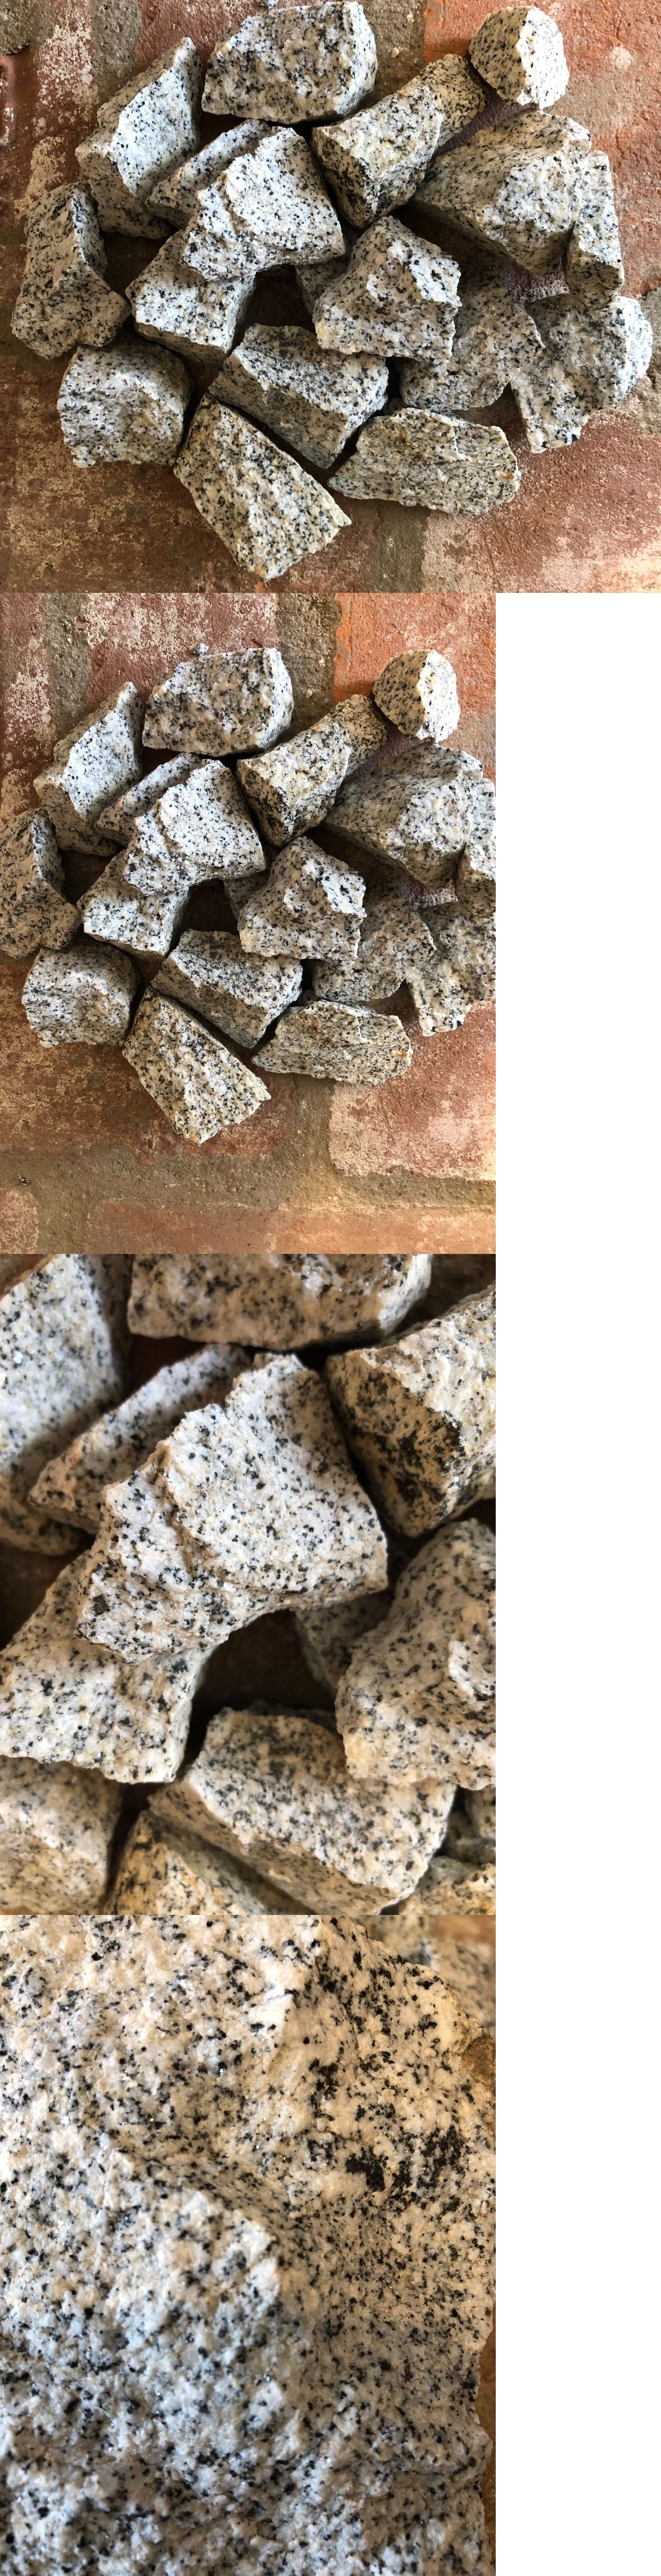 Landscape Rocks And Pebbles 118861 Dalmatian Granite 5 10 20 Or